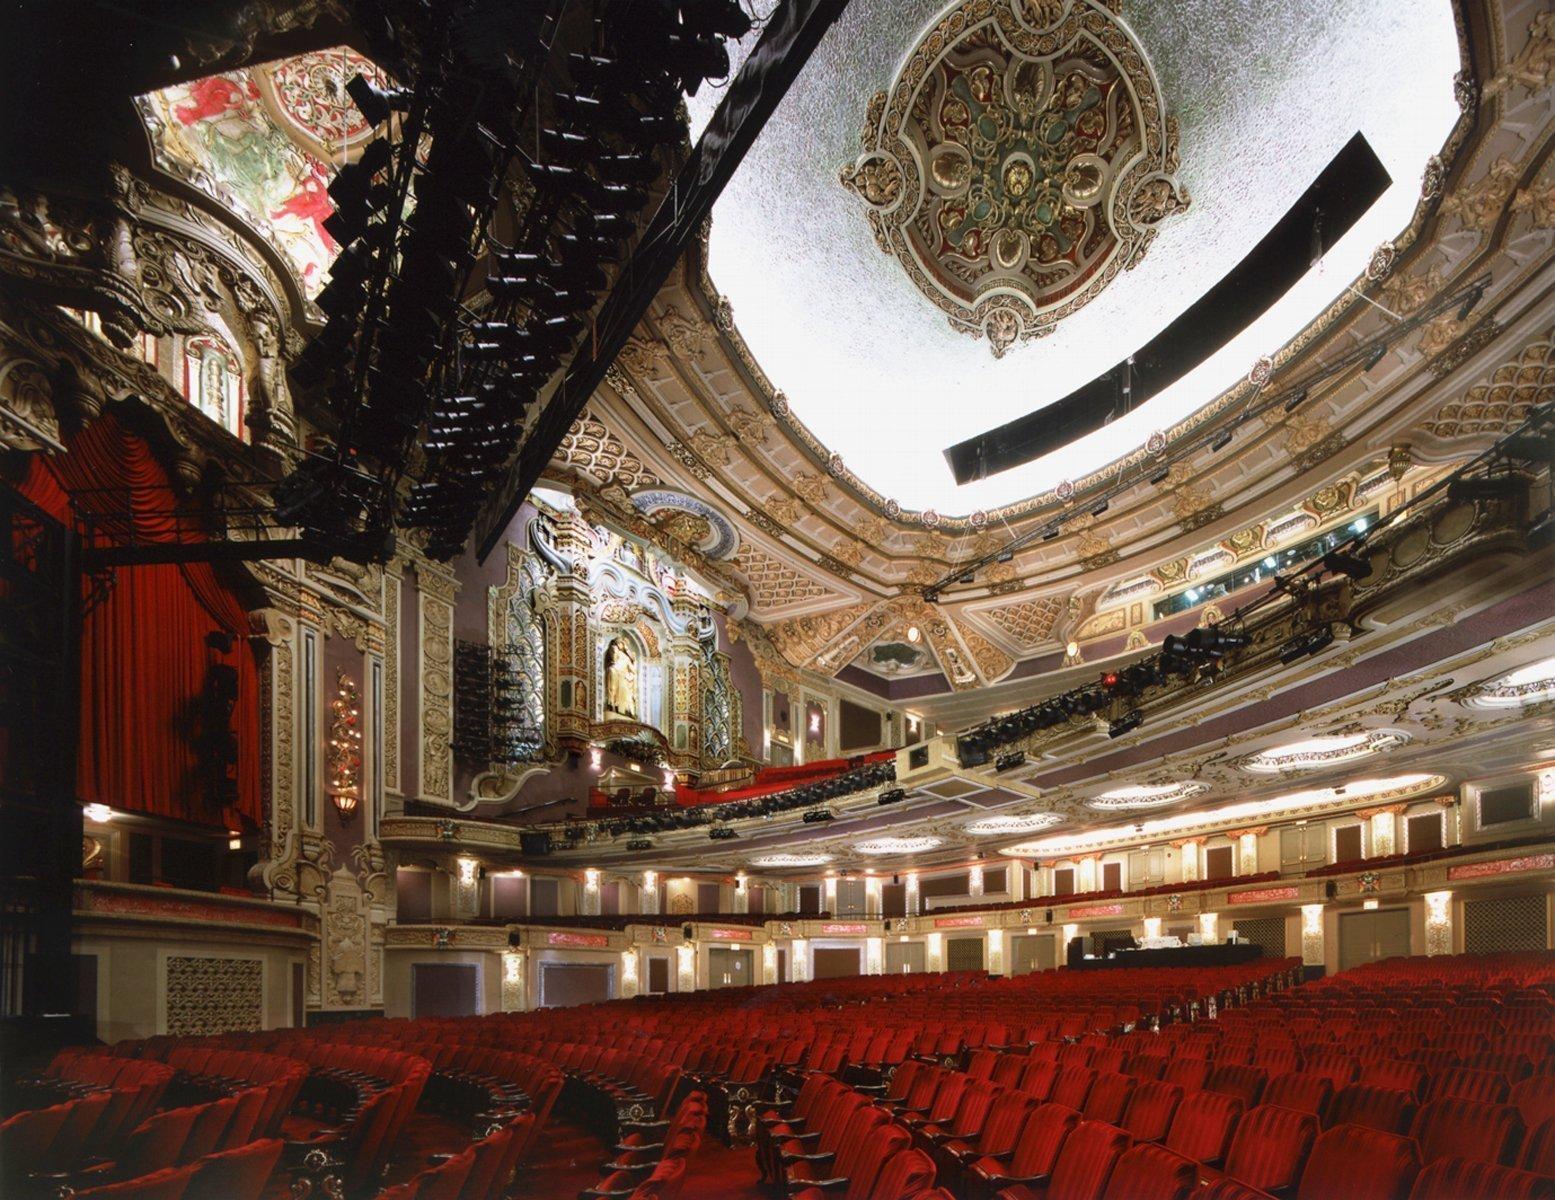 interno del teatro fantasmi